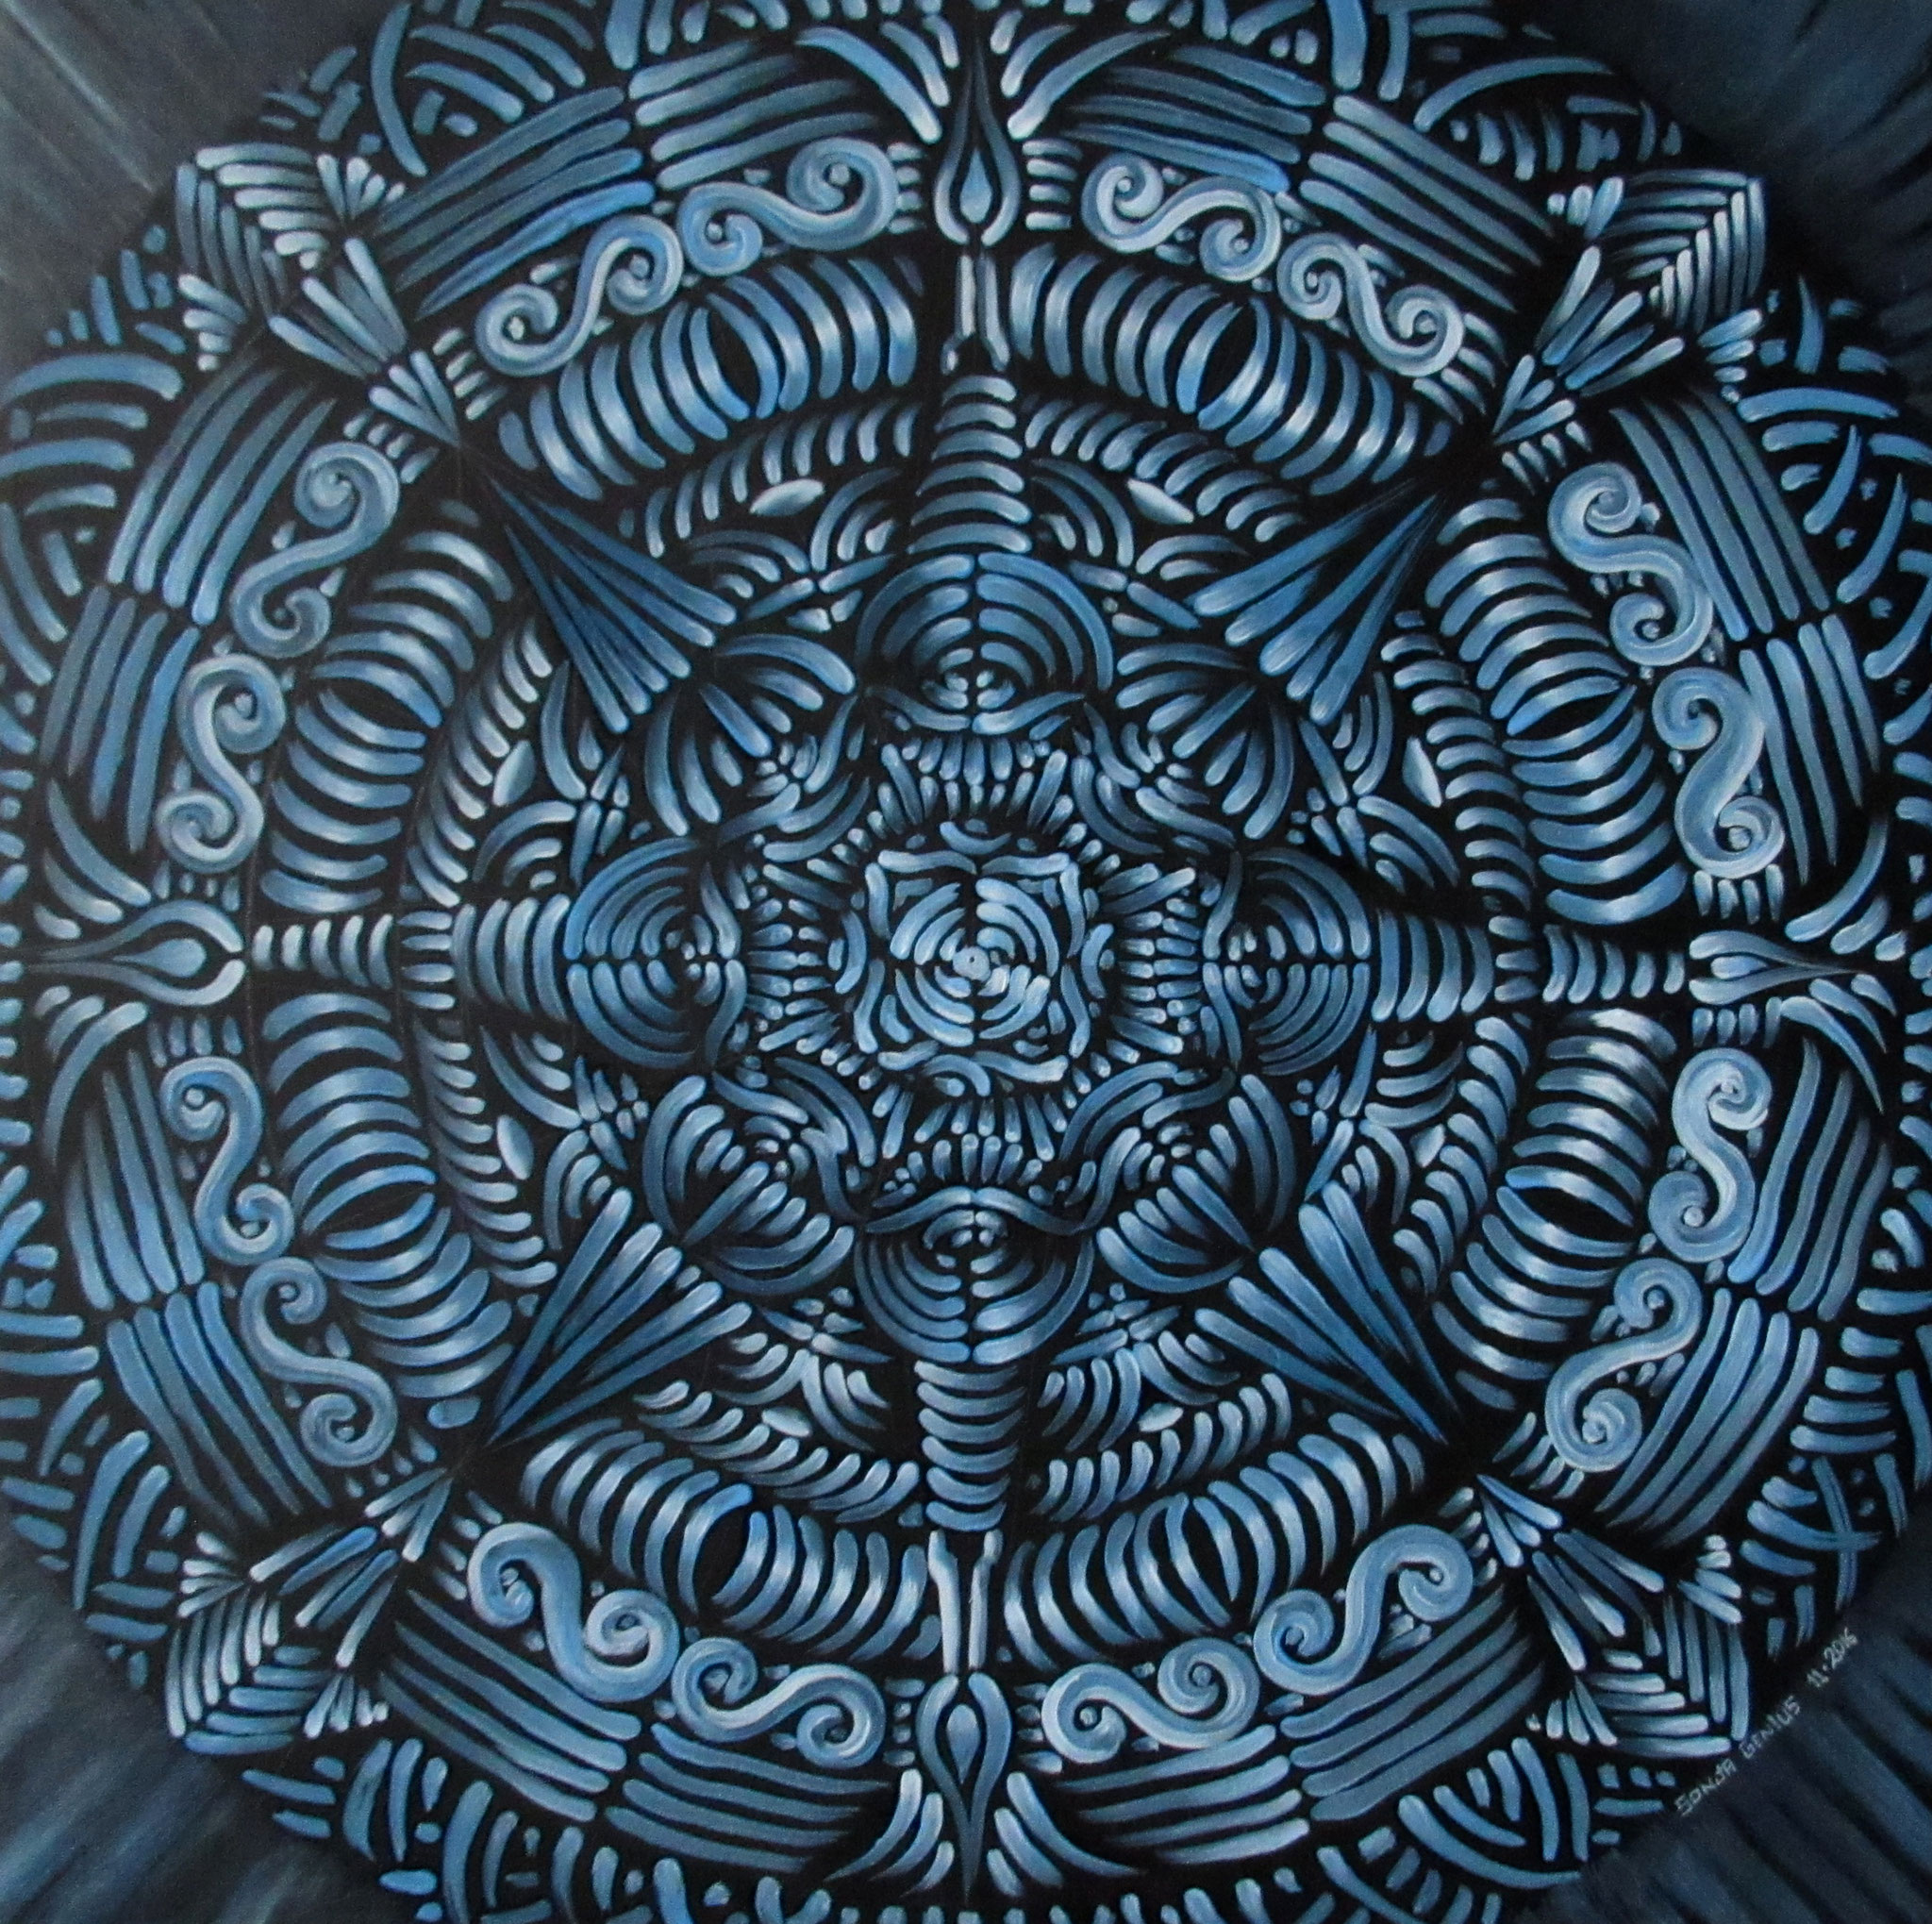 Blue Mandala, oil on canvas 16x16, October 2016 - (2)